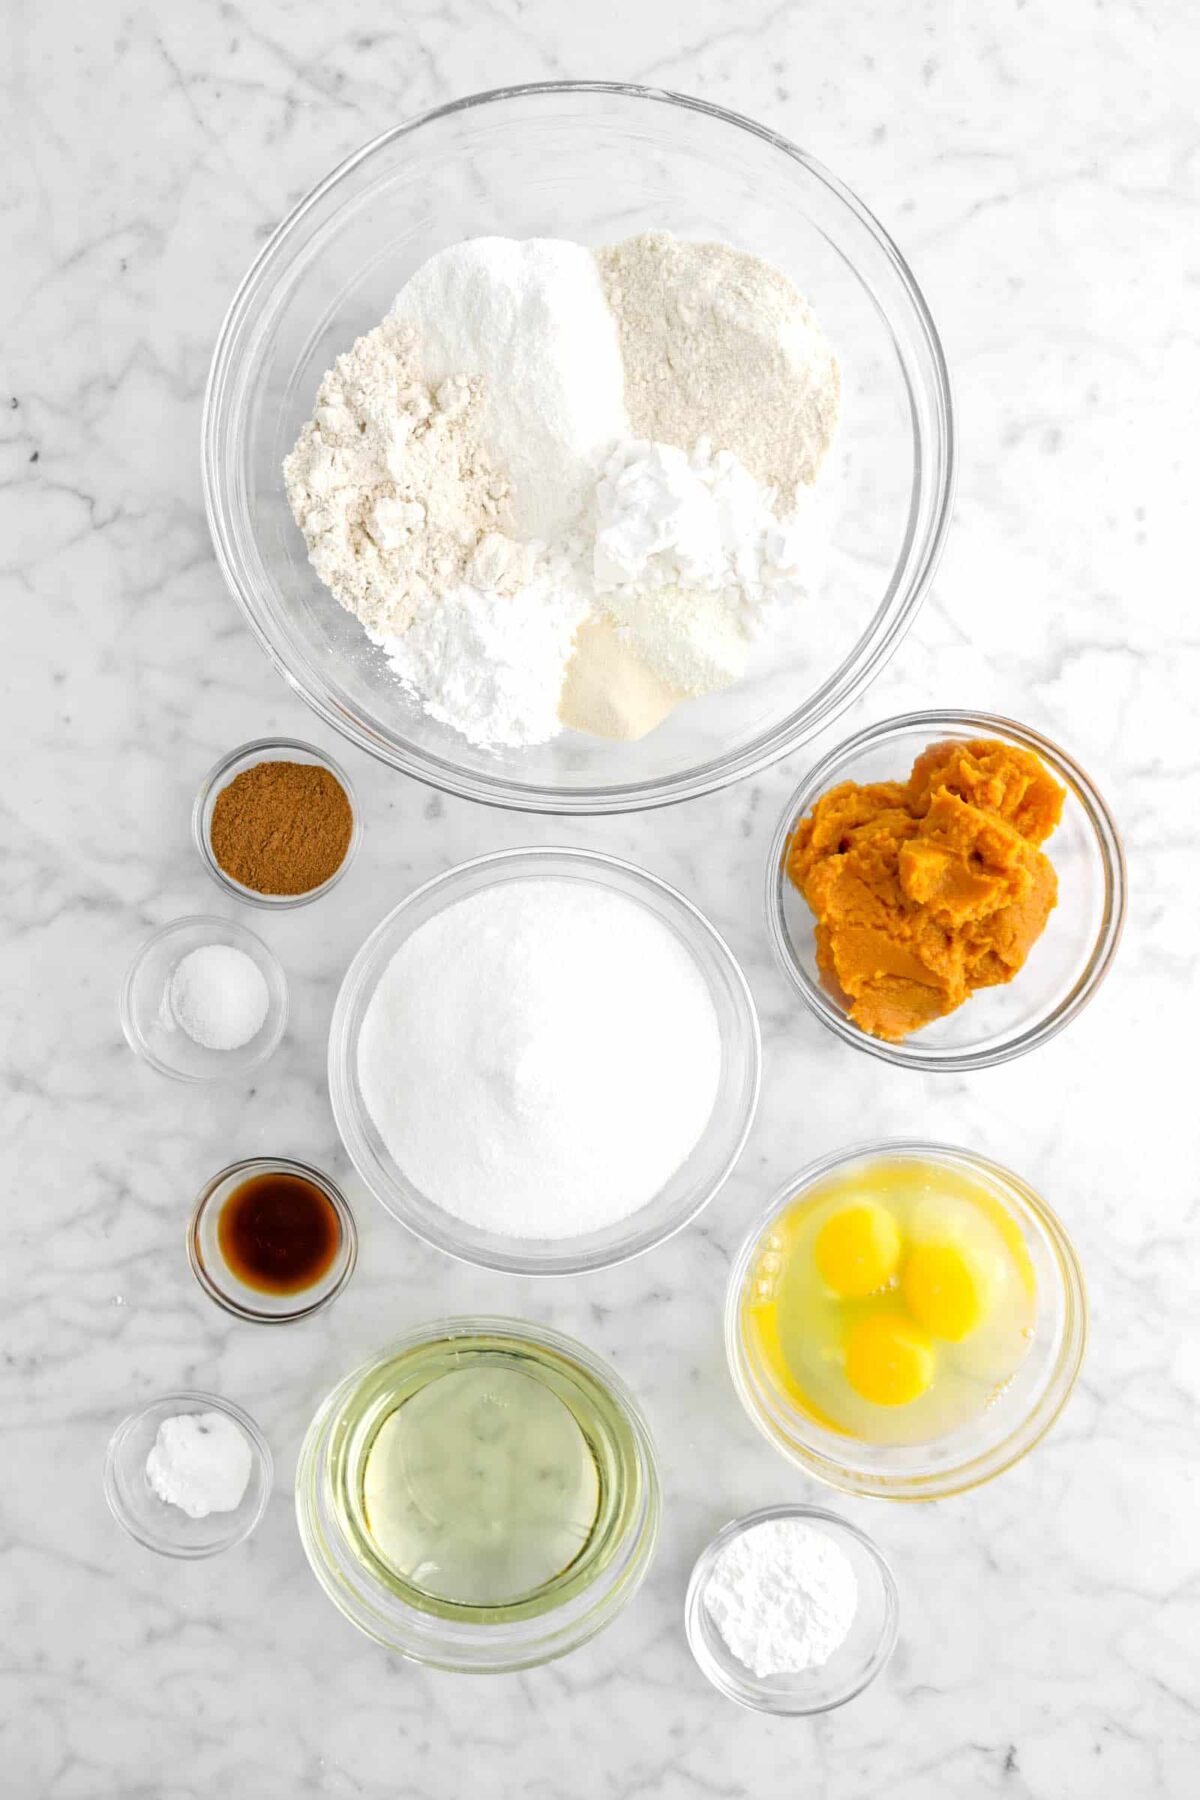 gluten free flours, pumpkin puree, sugar, spices, salt, vanilla, eggs, vegetable oil, baking powder, and baking soda in bowls on marble counter